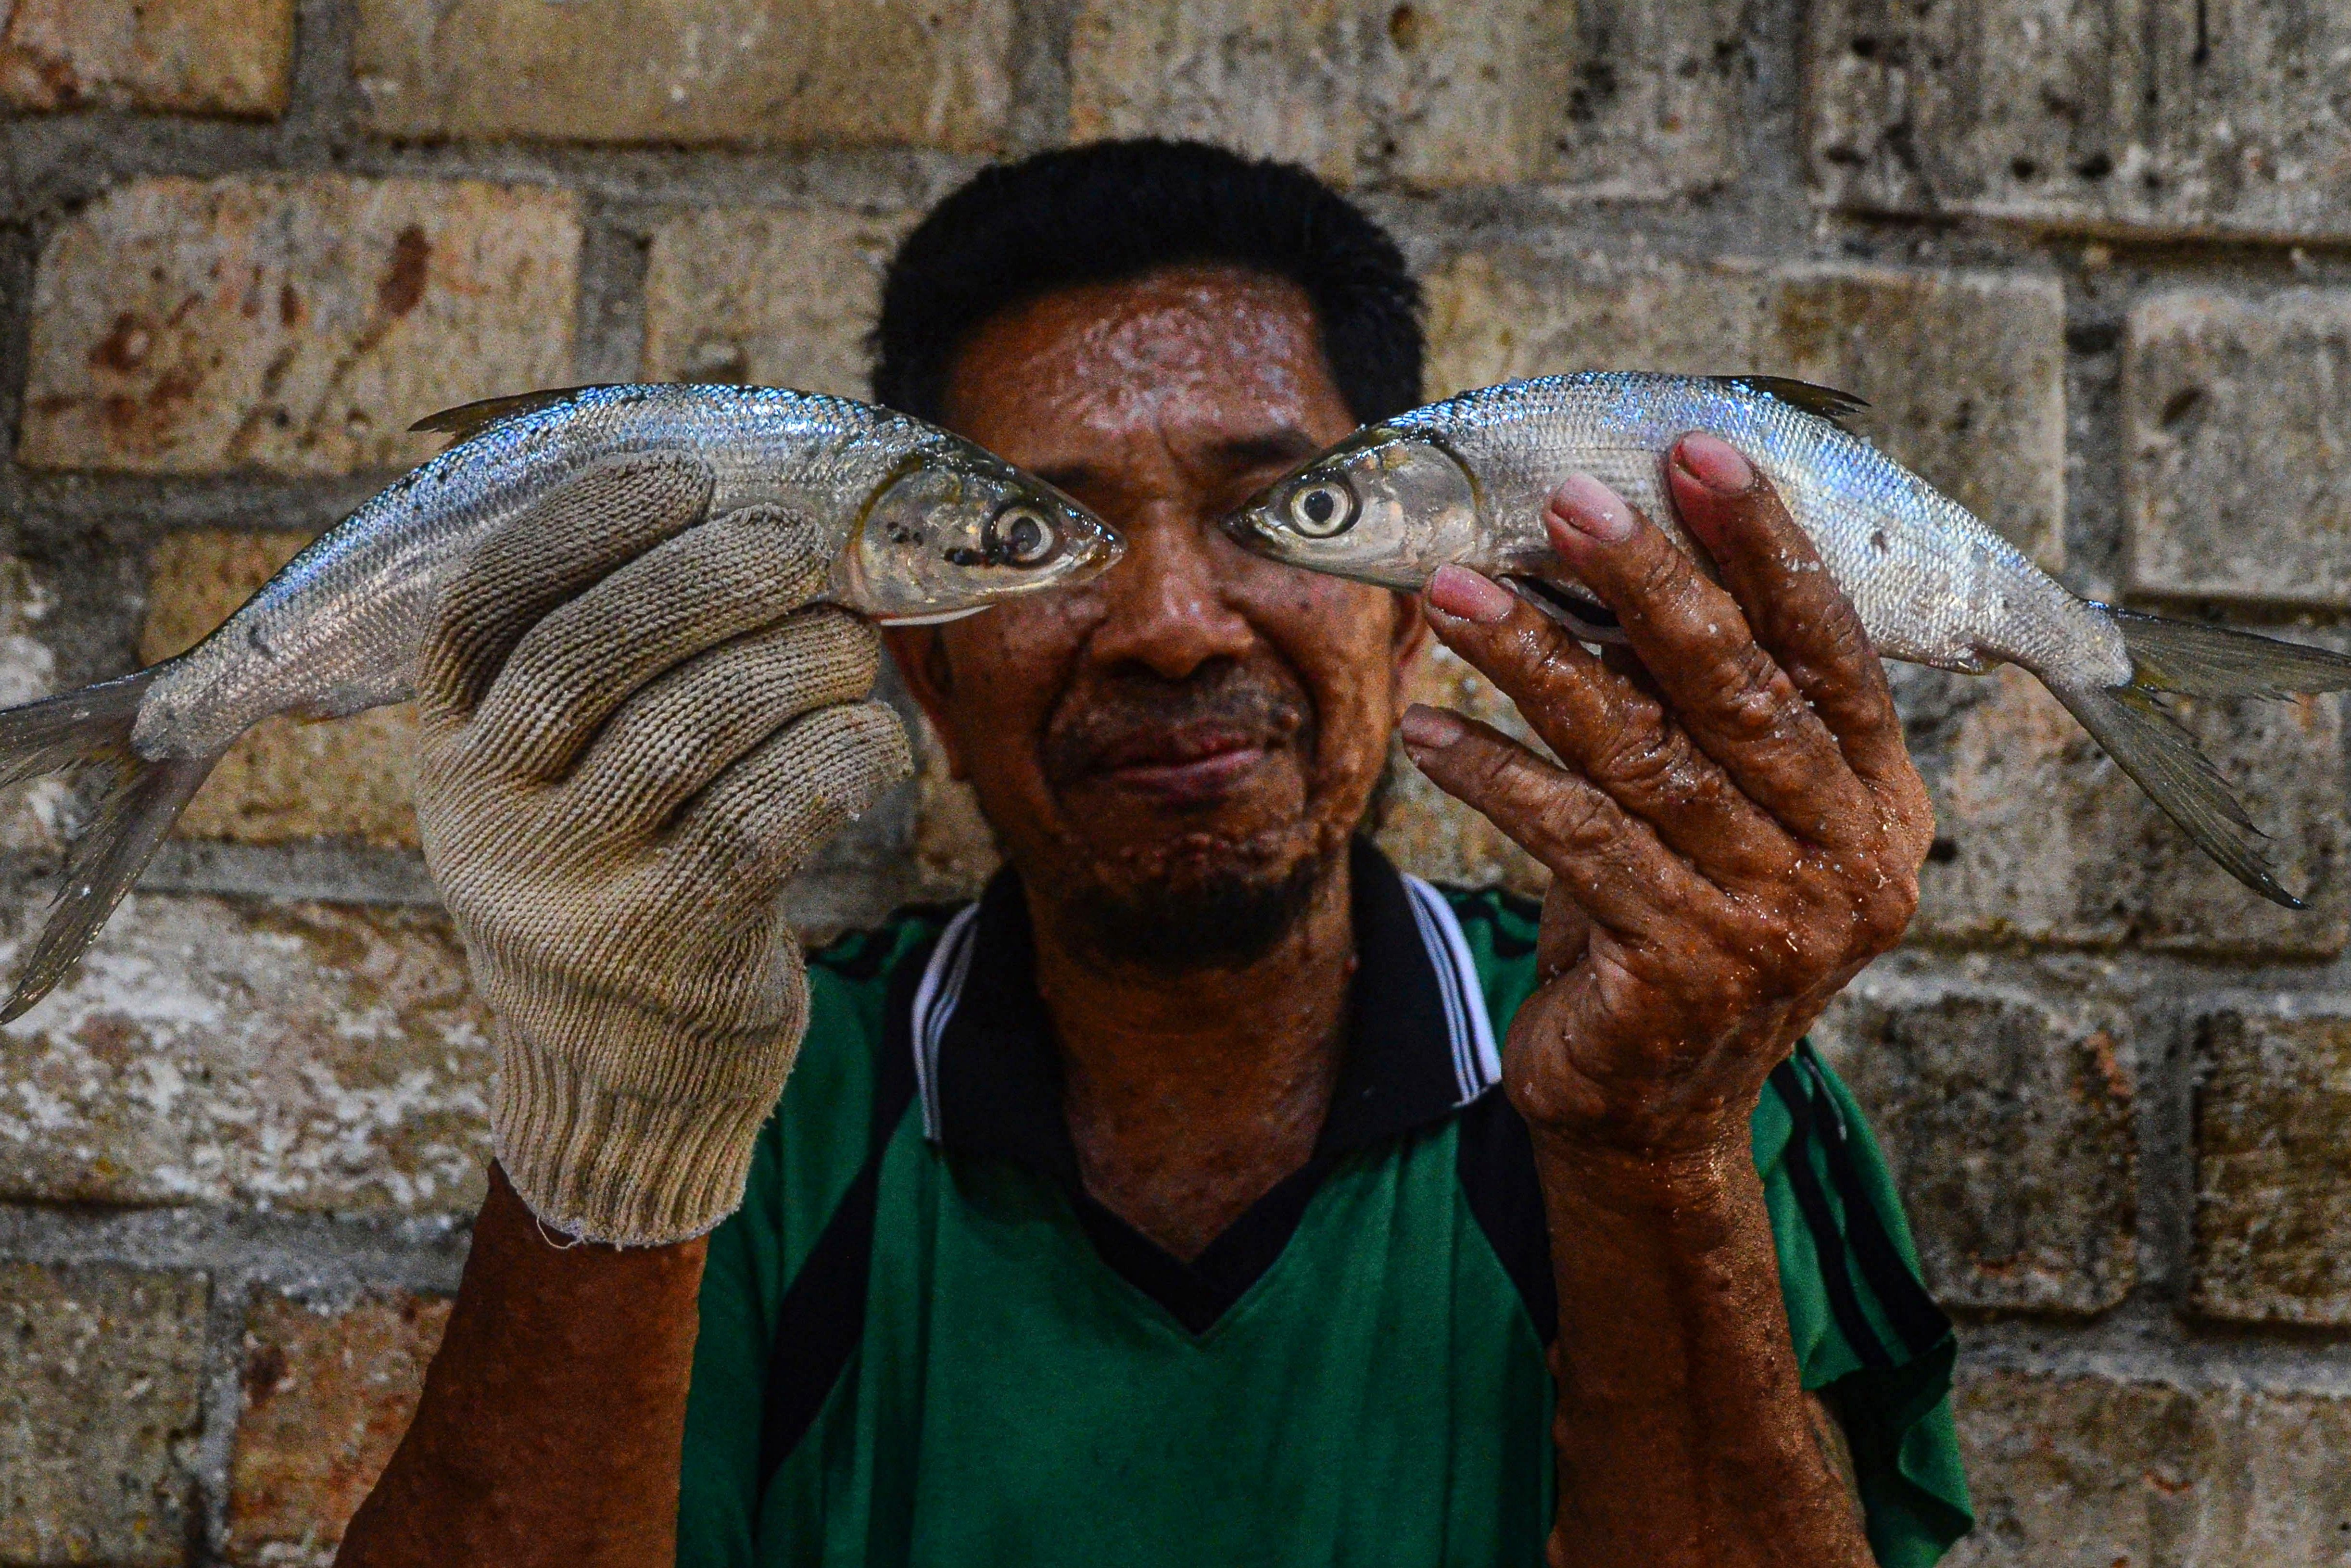 Pekerja menunjukkan ikan bandeng di Desa Dukutalit, Juwana, Pati, Jawa Tengah.